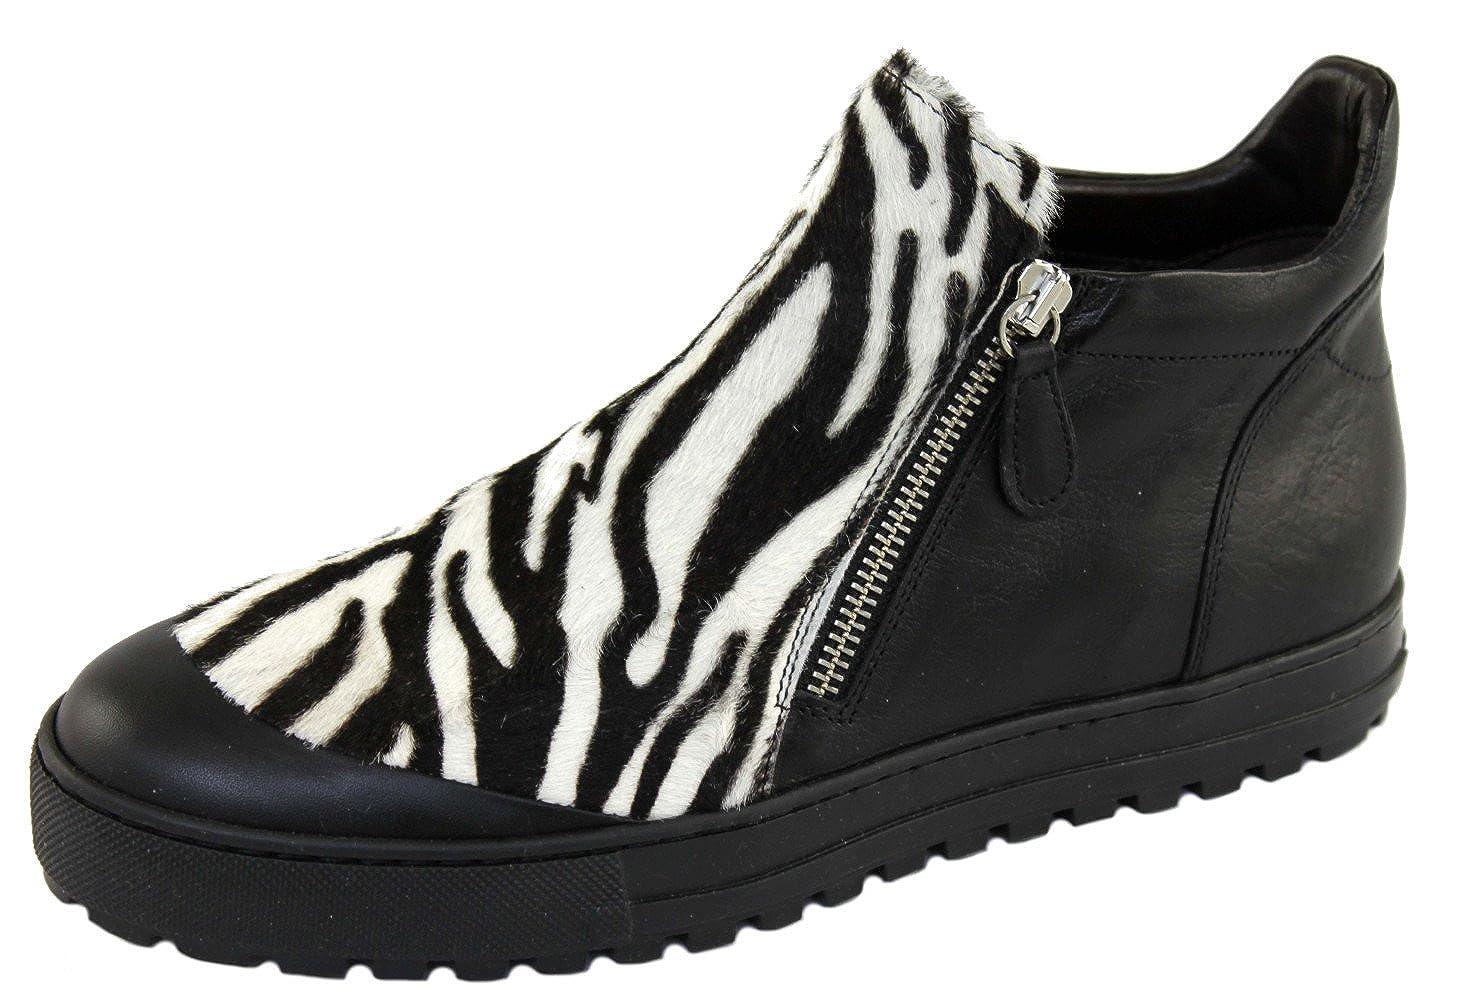 Laura Bellariva Damenschuhe Damenschuhe Damenschuhe Schuhe Kurzstiefeletten  Schuhe 4800E schwarz-weiß - 107dd6 30c41c24c6